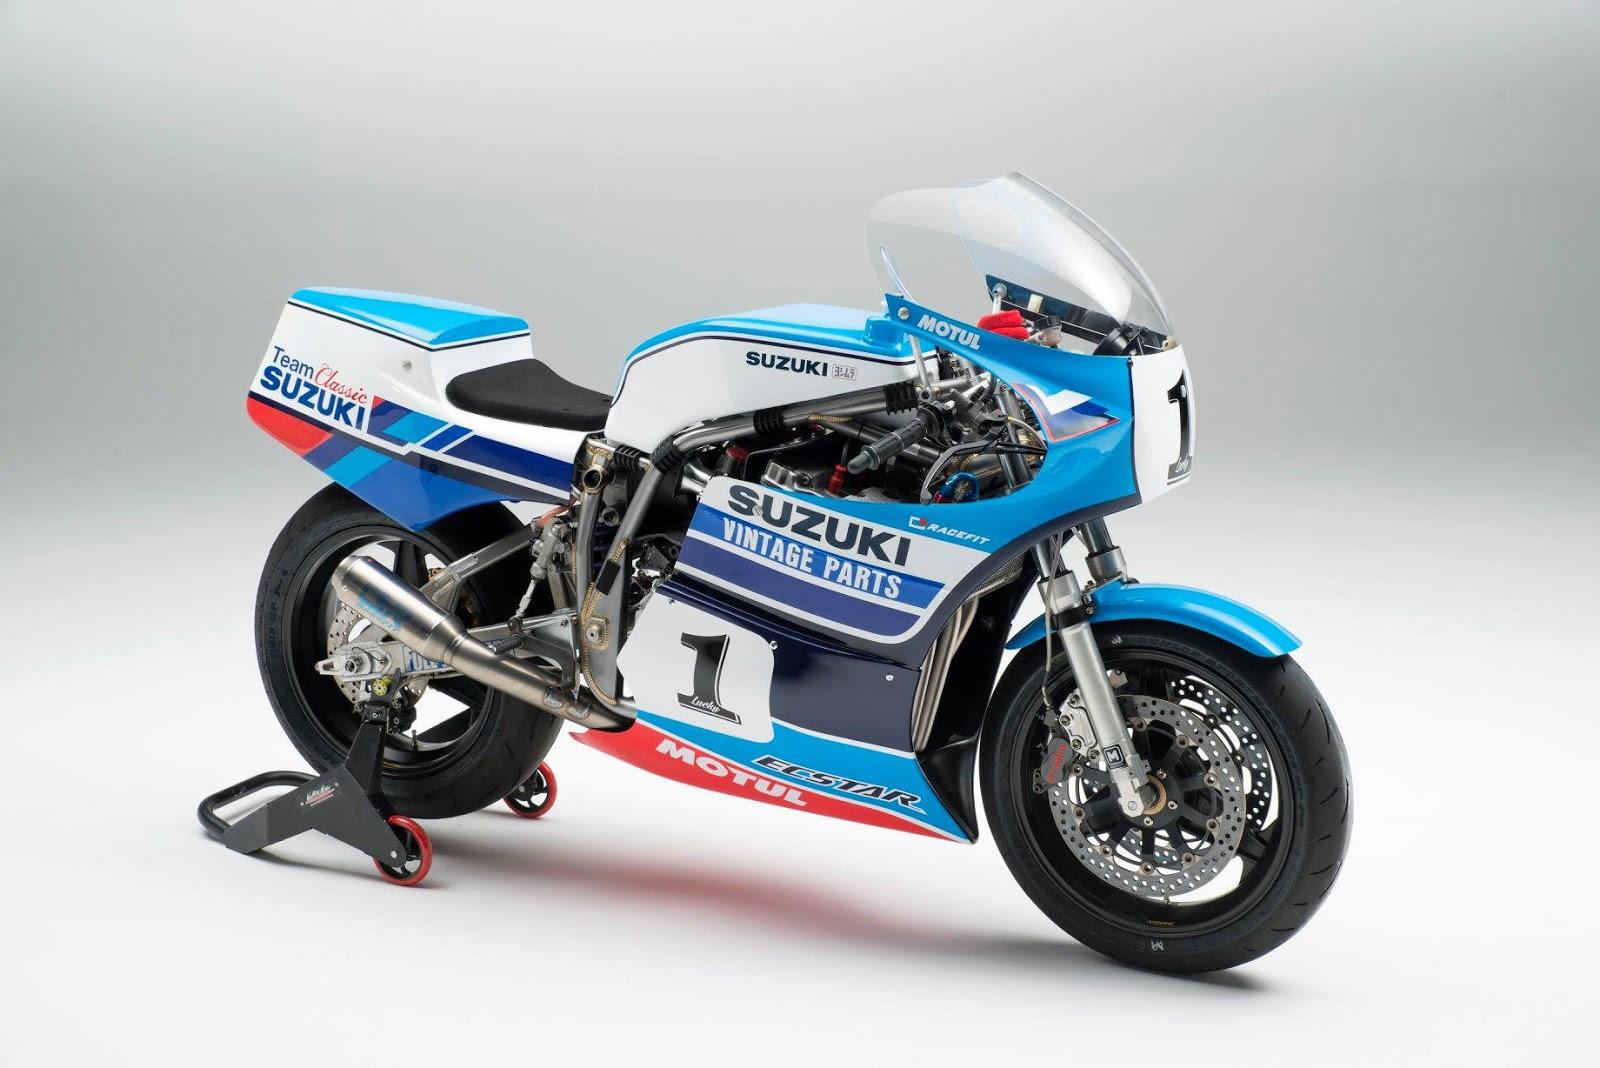 Suzuki Katana Parts For Sale